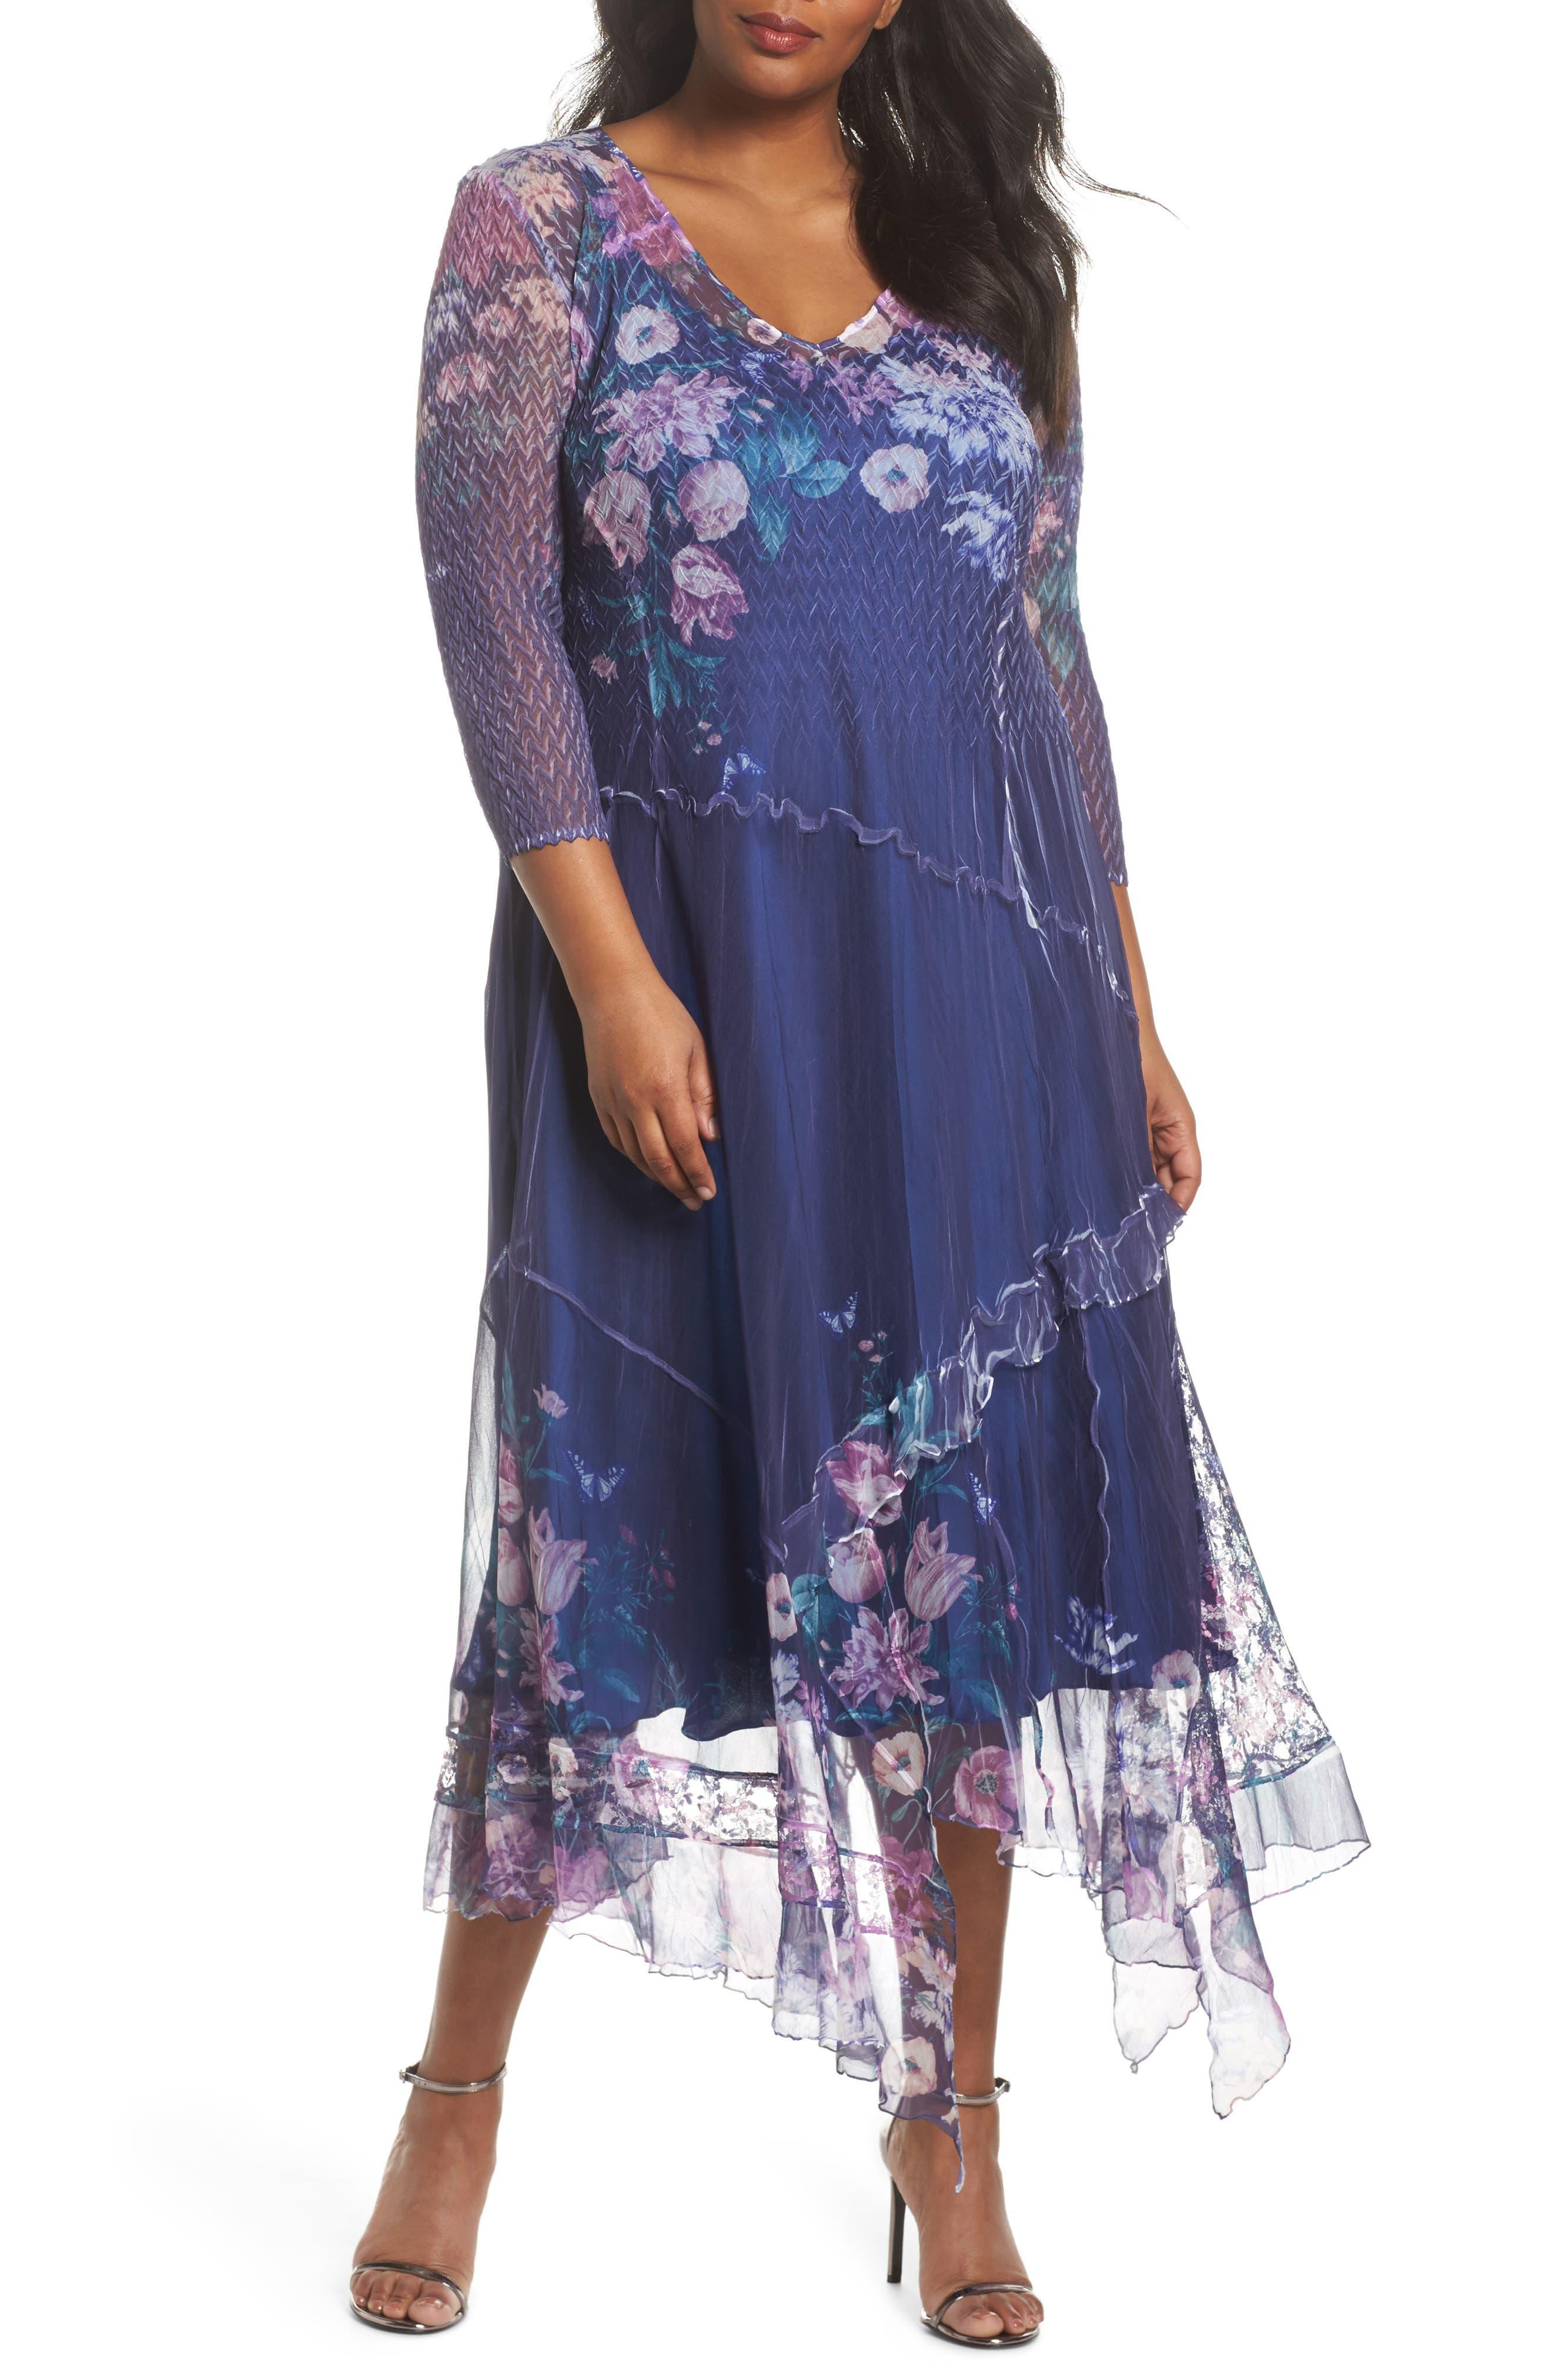 Alternate Image 1 Selected - Komarov Chiffon Handkerchief Hem Dress (Plus Size)